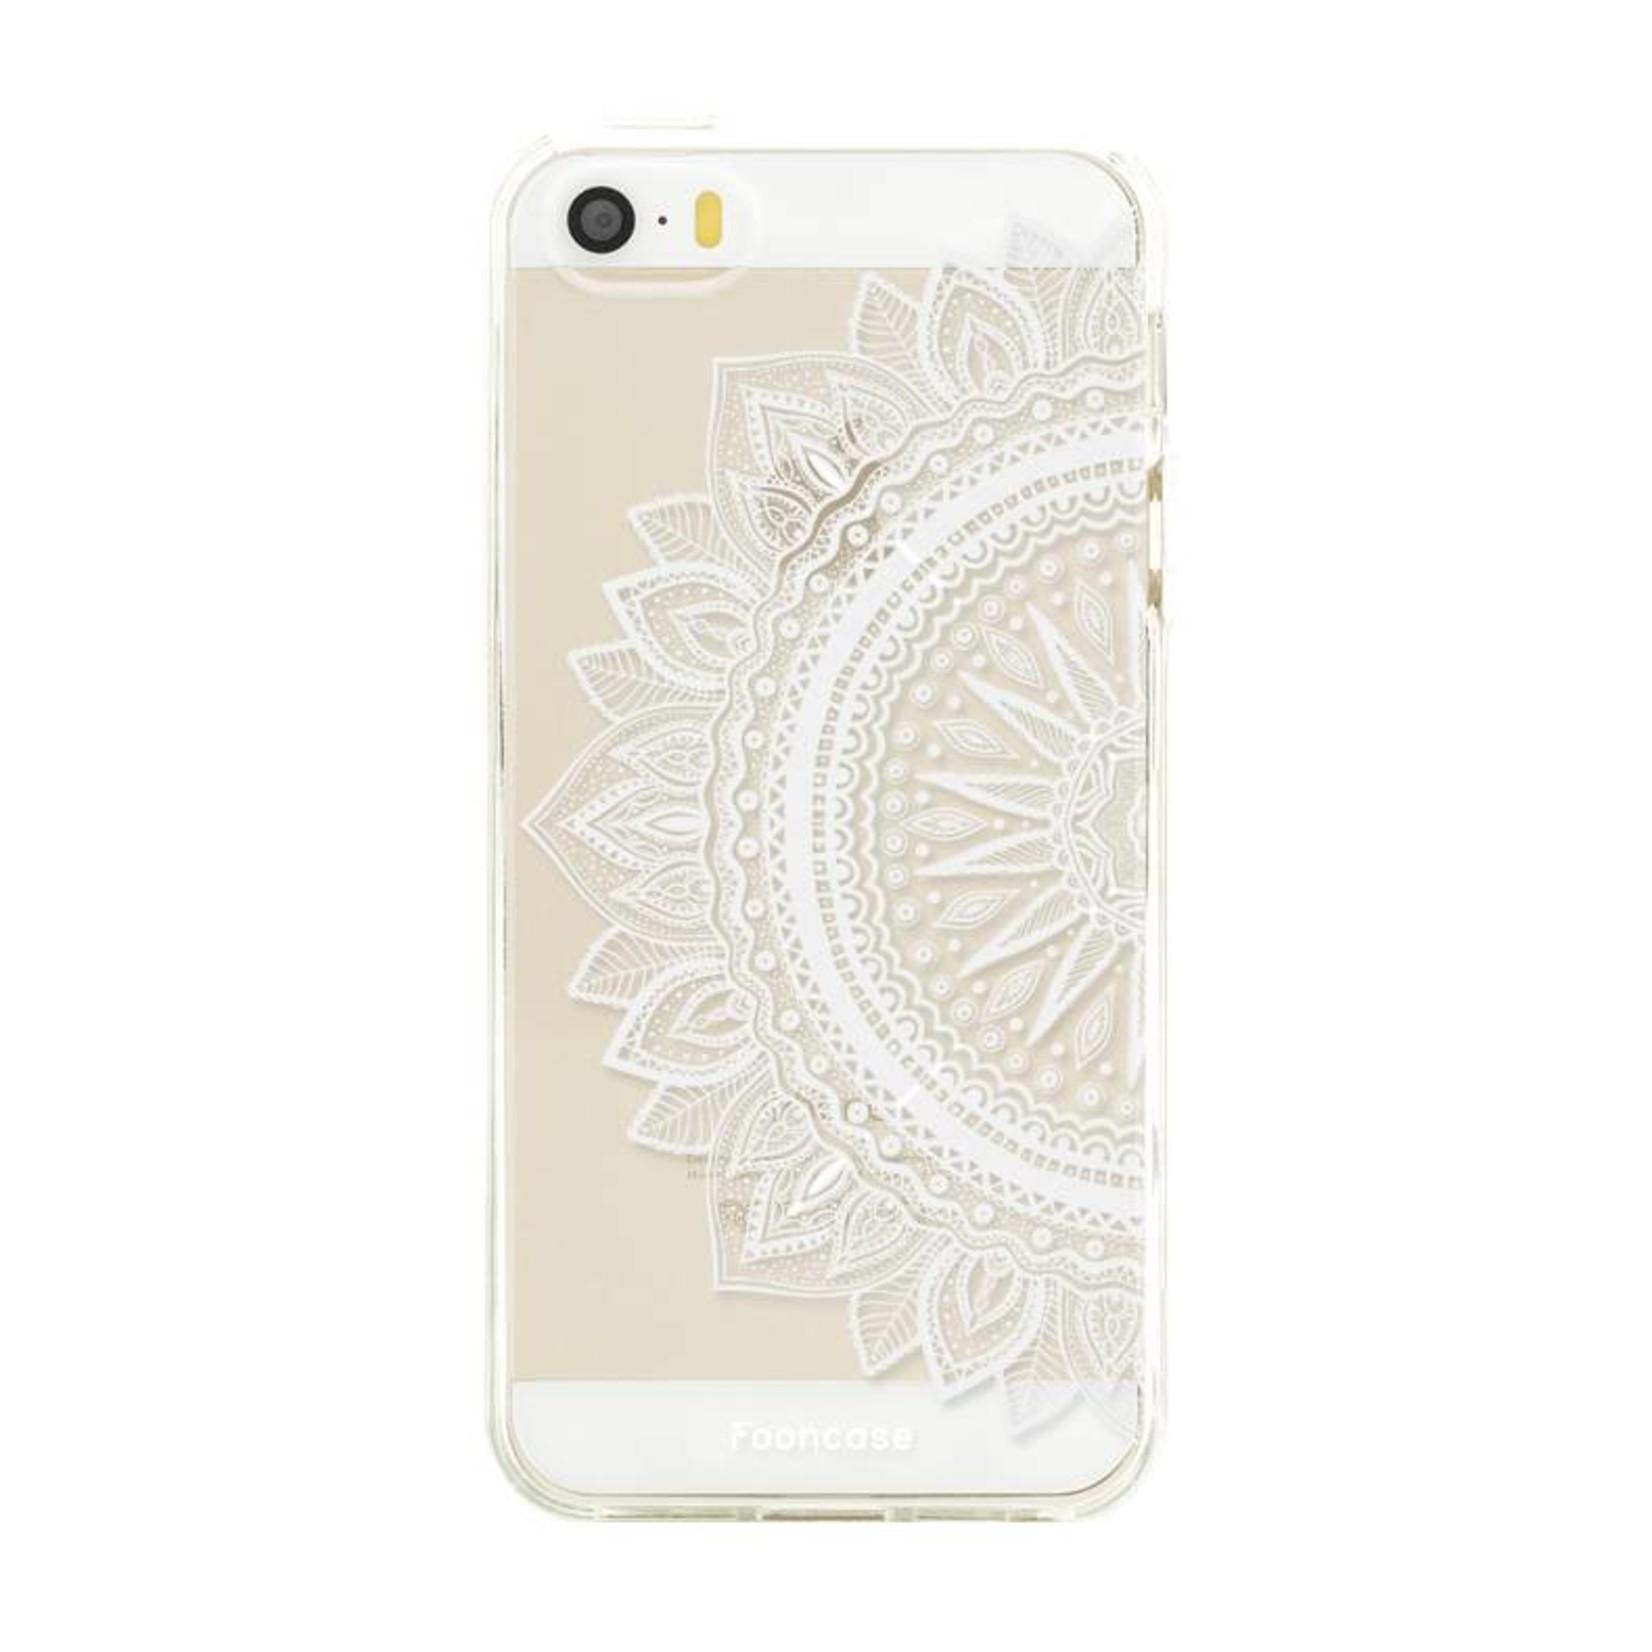 FOONCASE iPhone 5 / 5S hoesje TPU Soft Case - Back Cover - Mandala / Ibiza